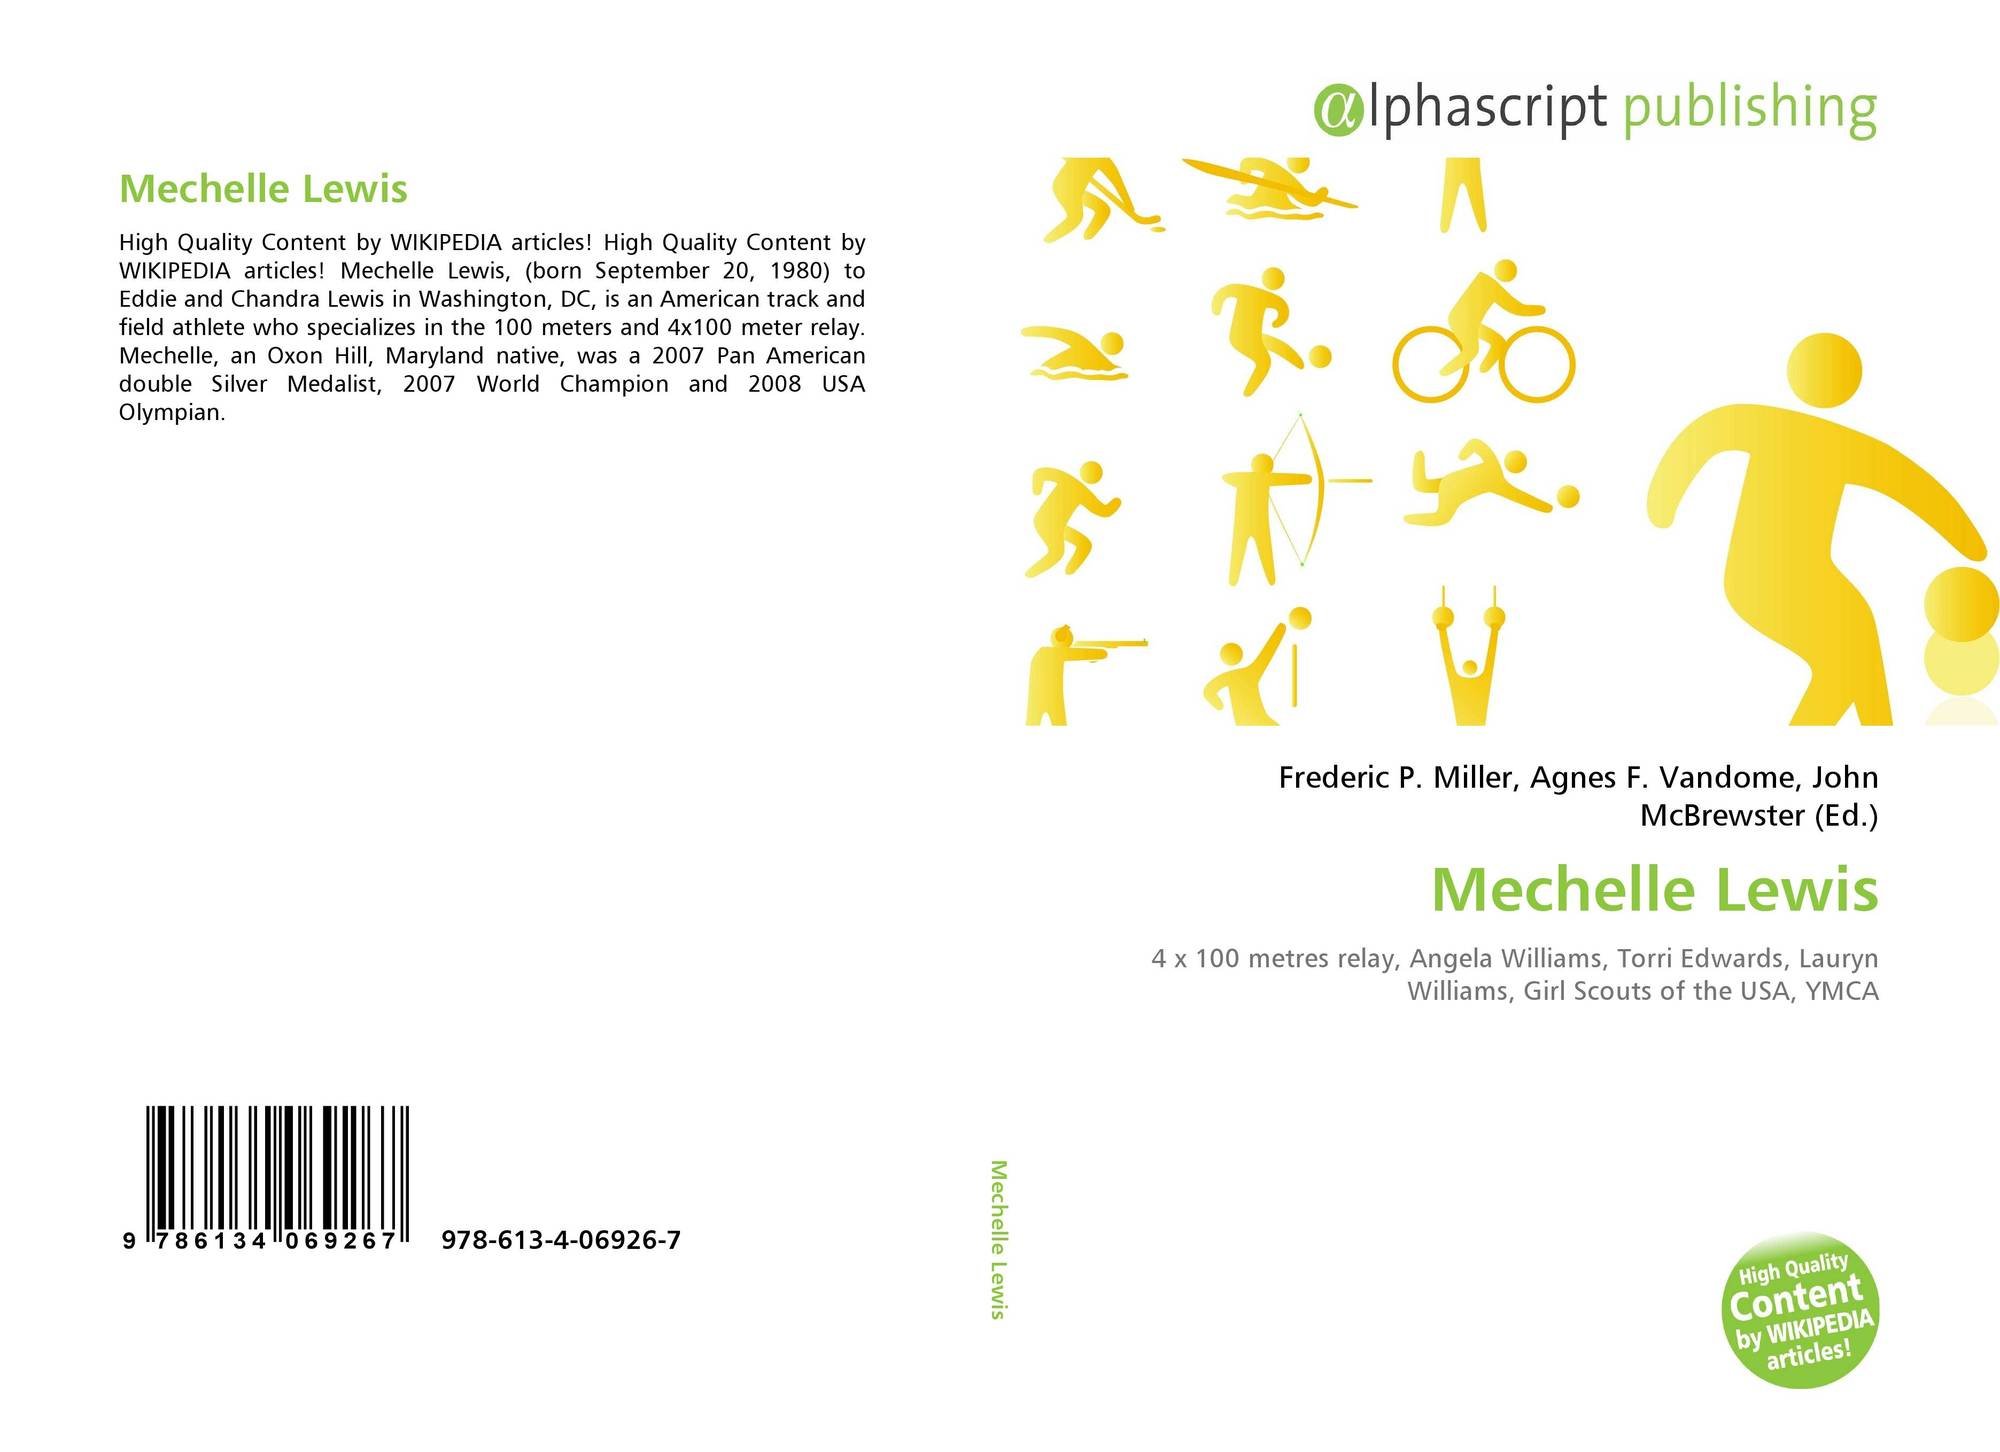 Angela Lewis Wikipedia mechelle lewis, 978-613-4-06926-7, 6134069264 ,9786134069267